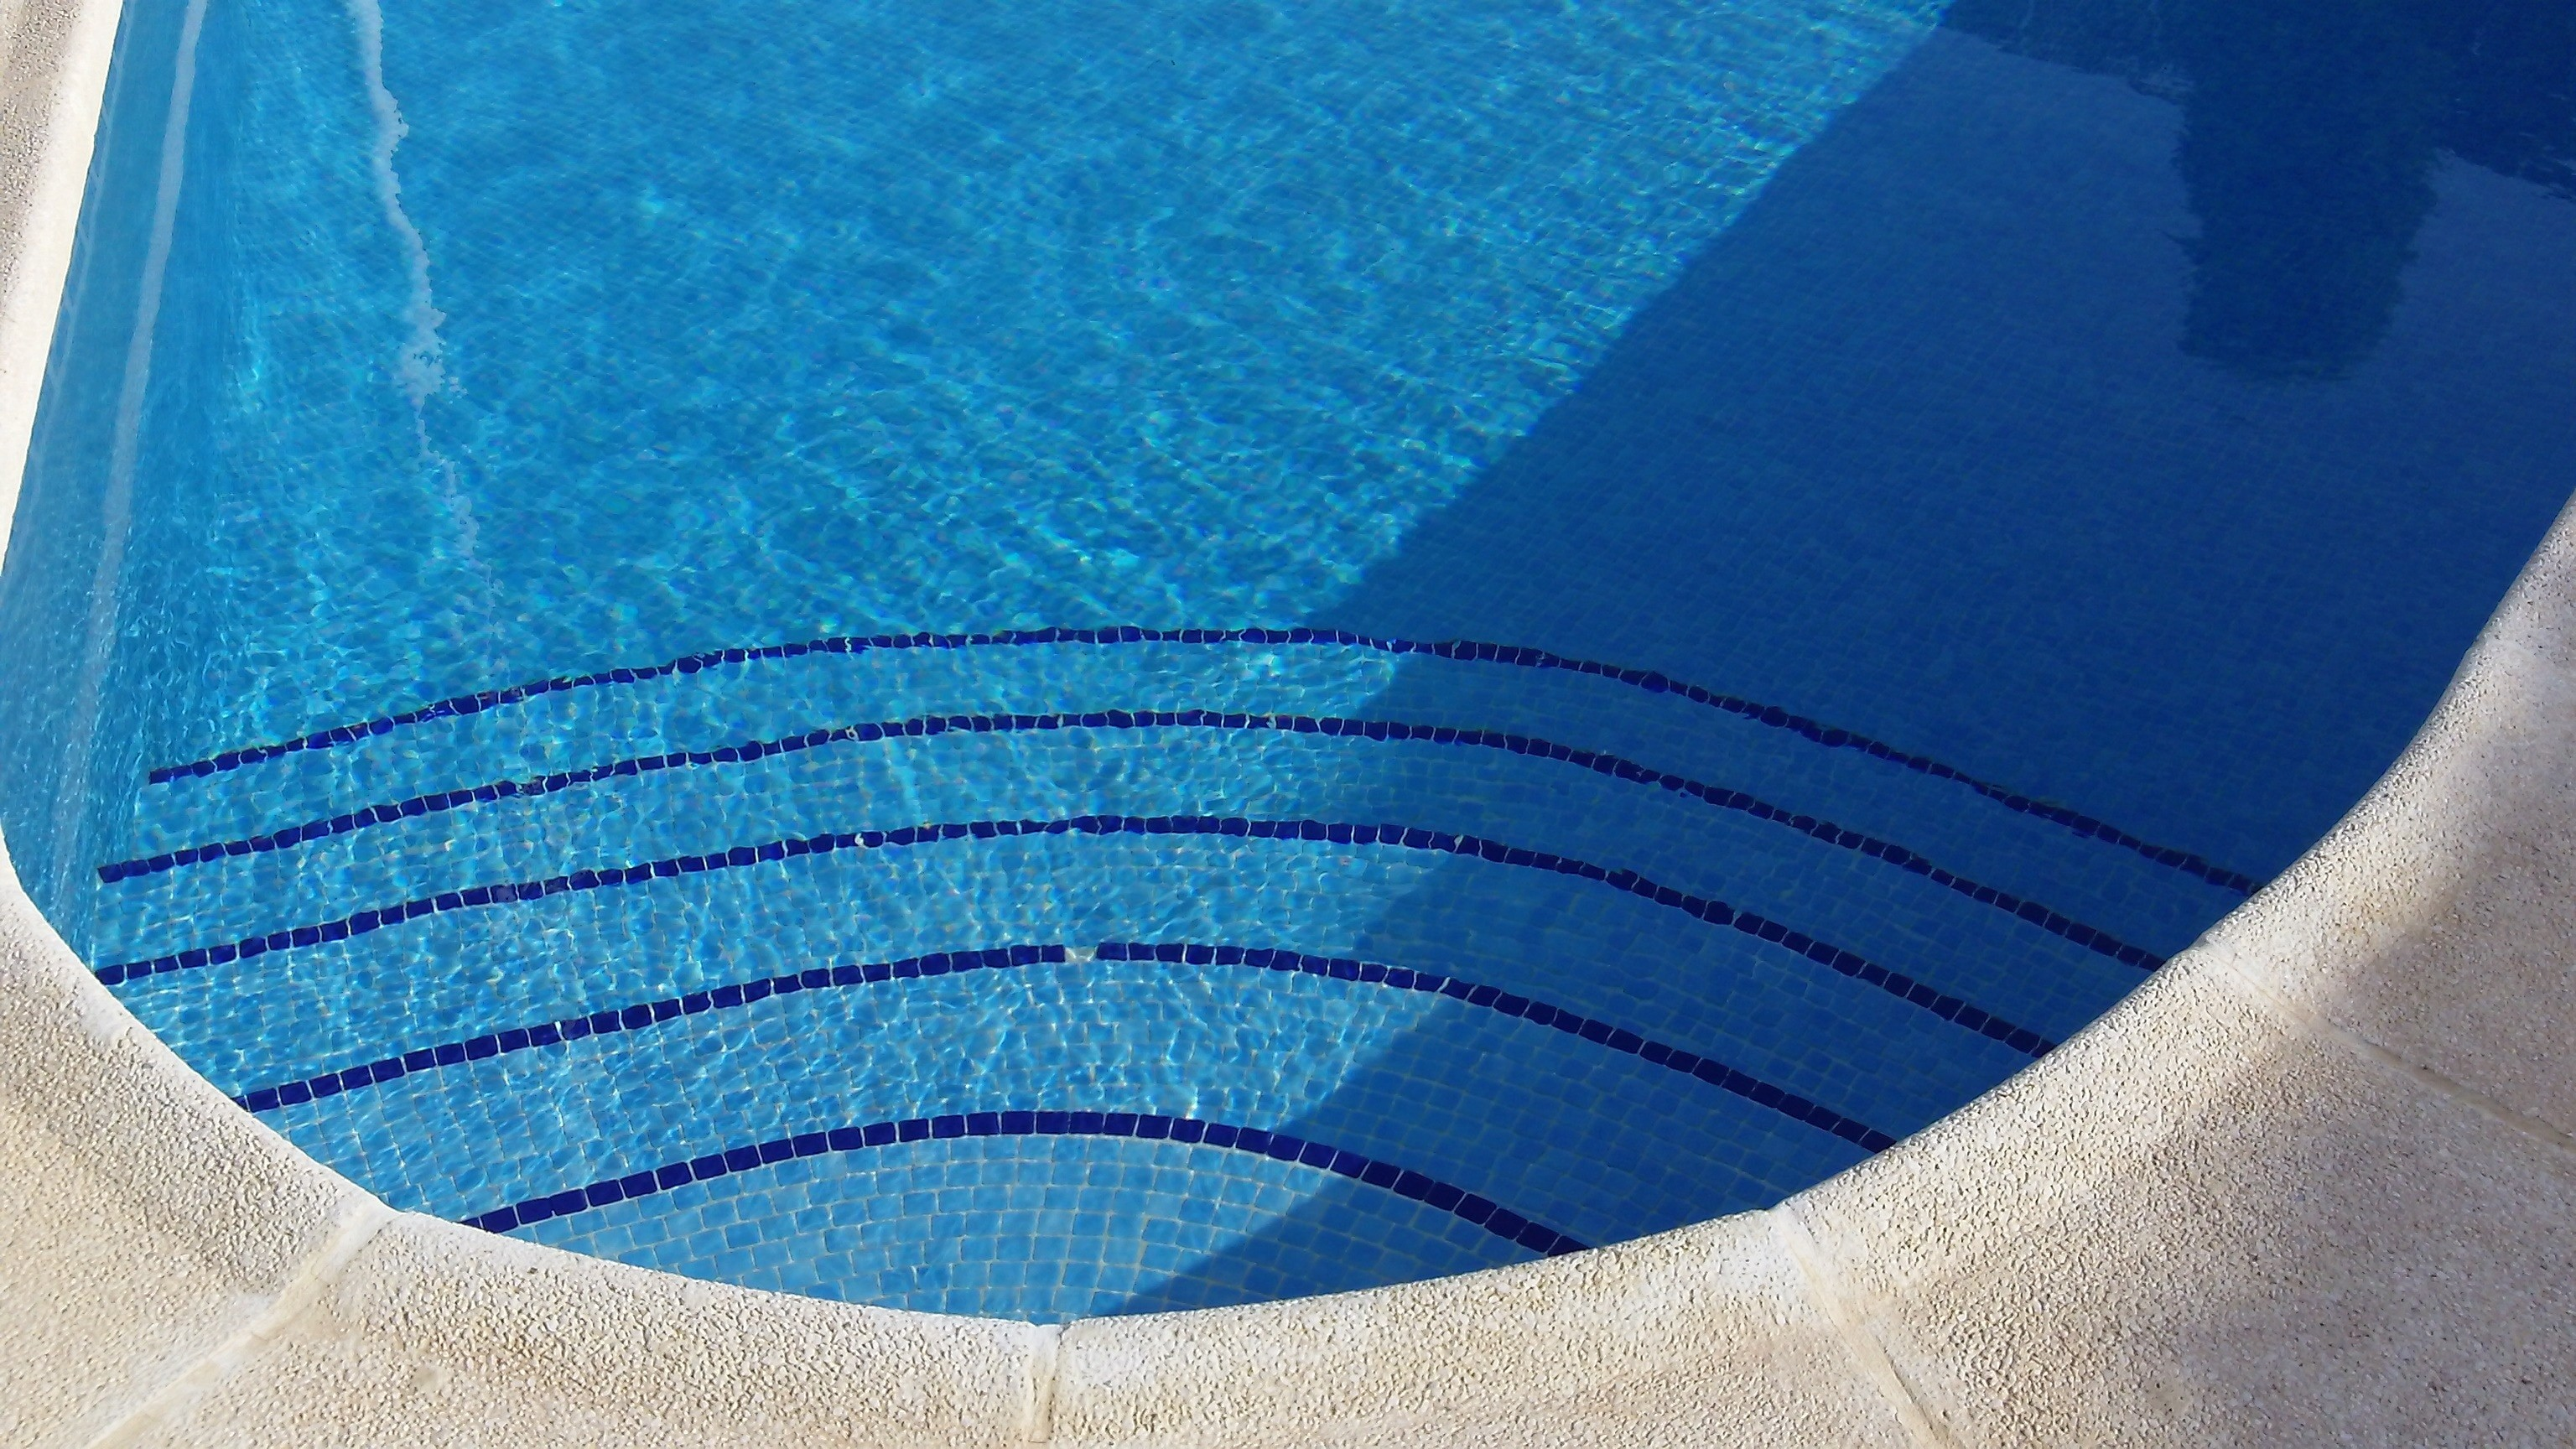 … Clear Pool Water Wallpaper